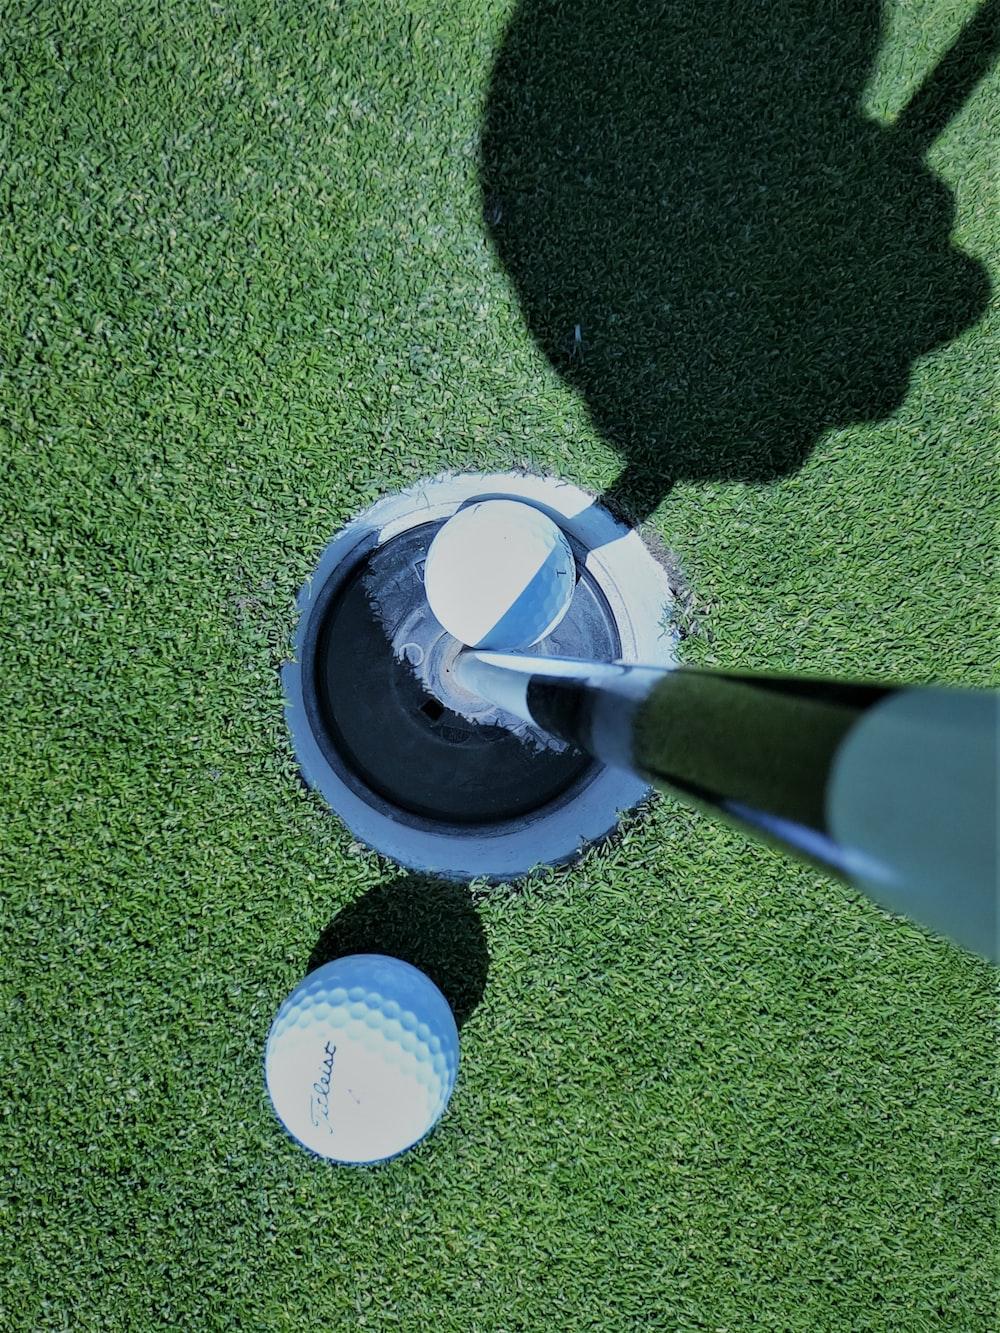 white golf ball on goal hole